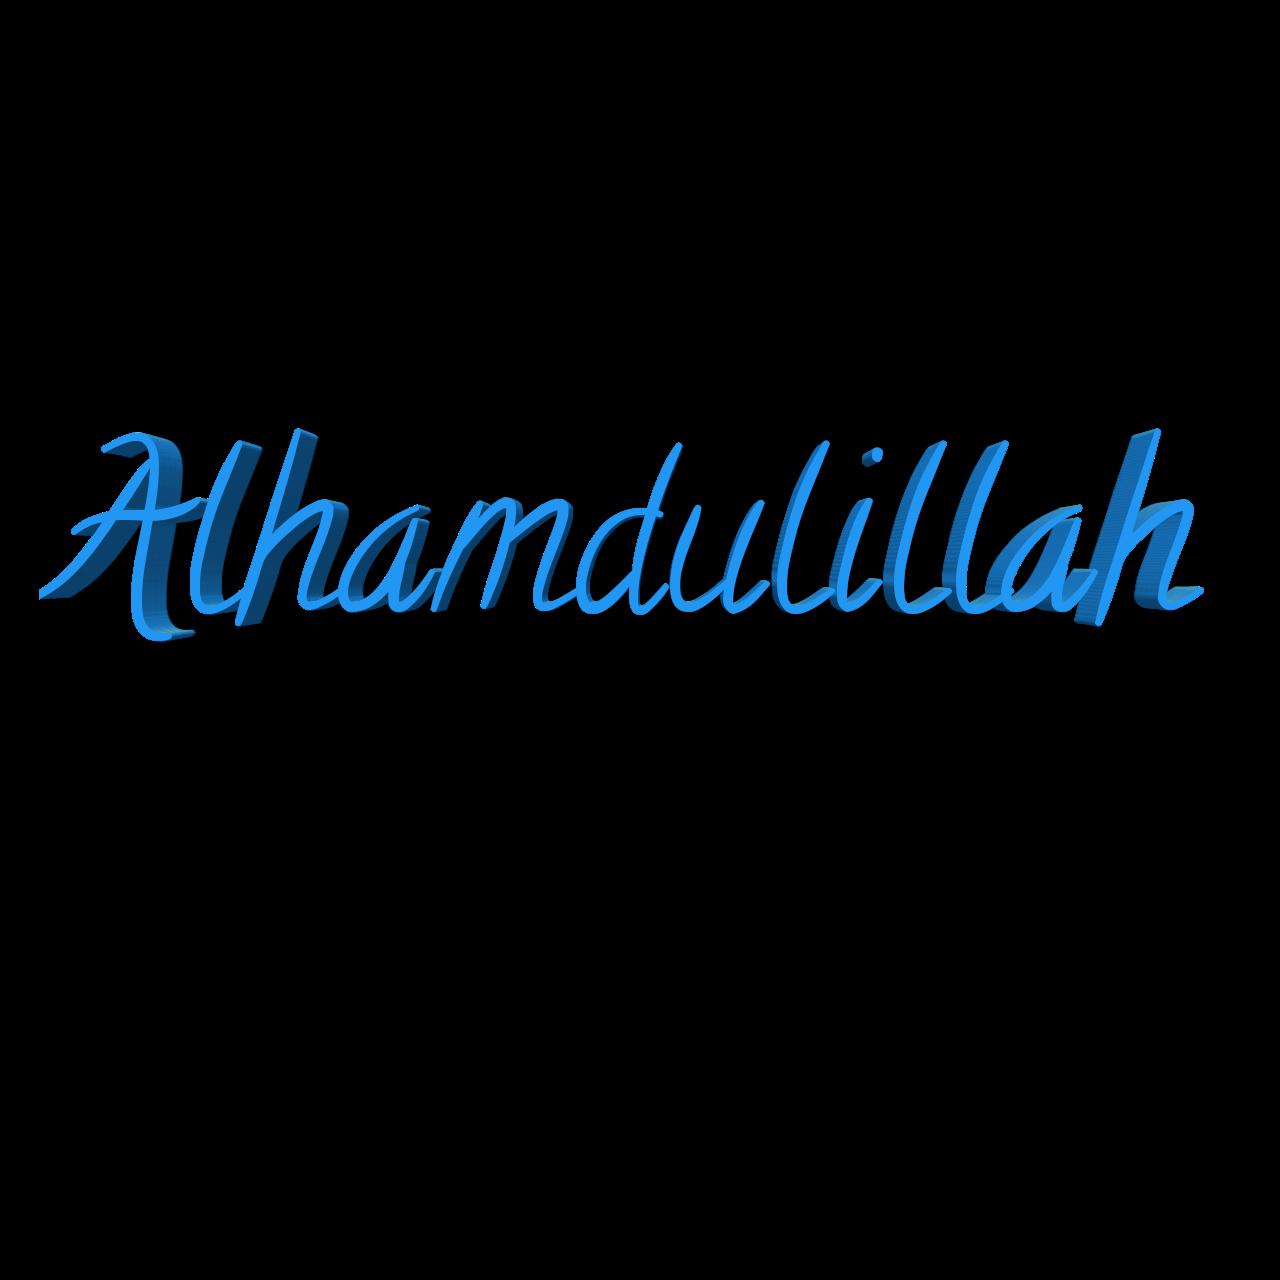 alhamdulillah - Sticker by Rajon Ahmed